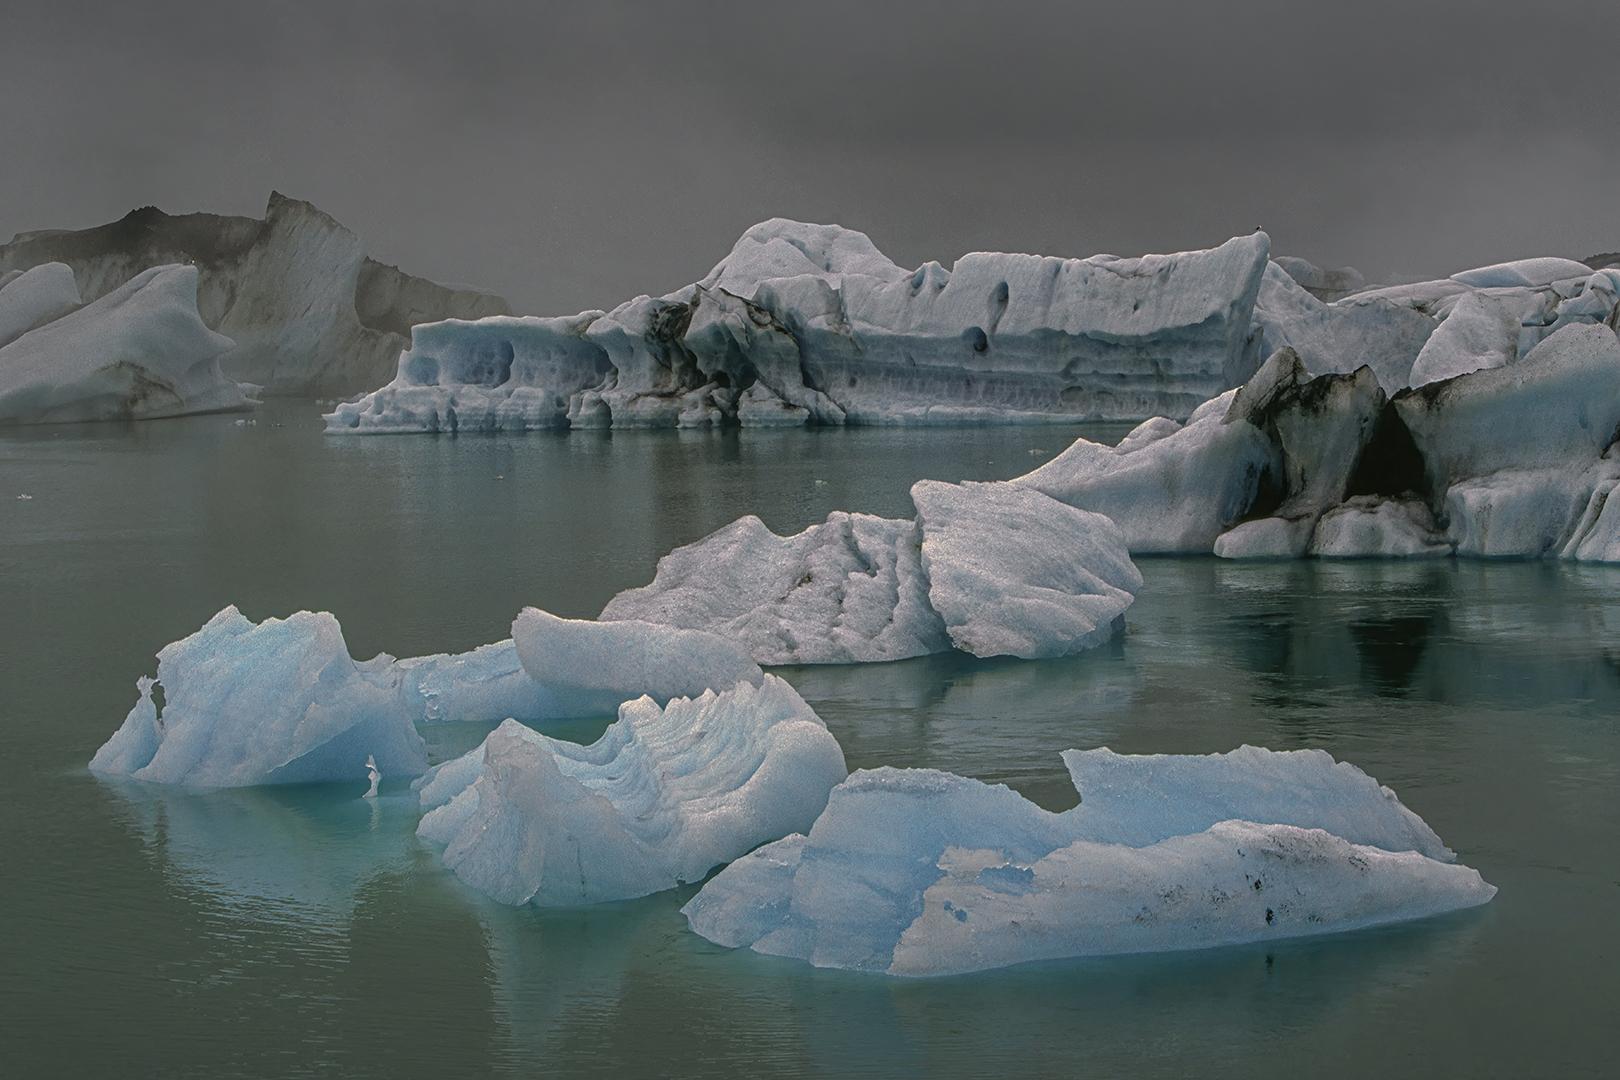 2004_800-20 Gletsjermist B_DeNoise_1620